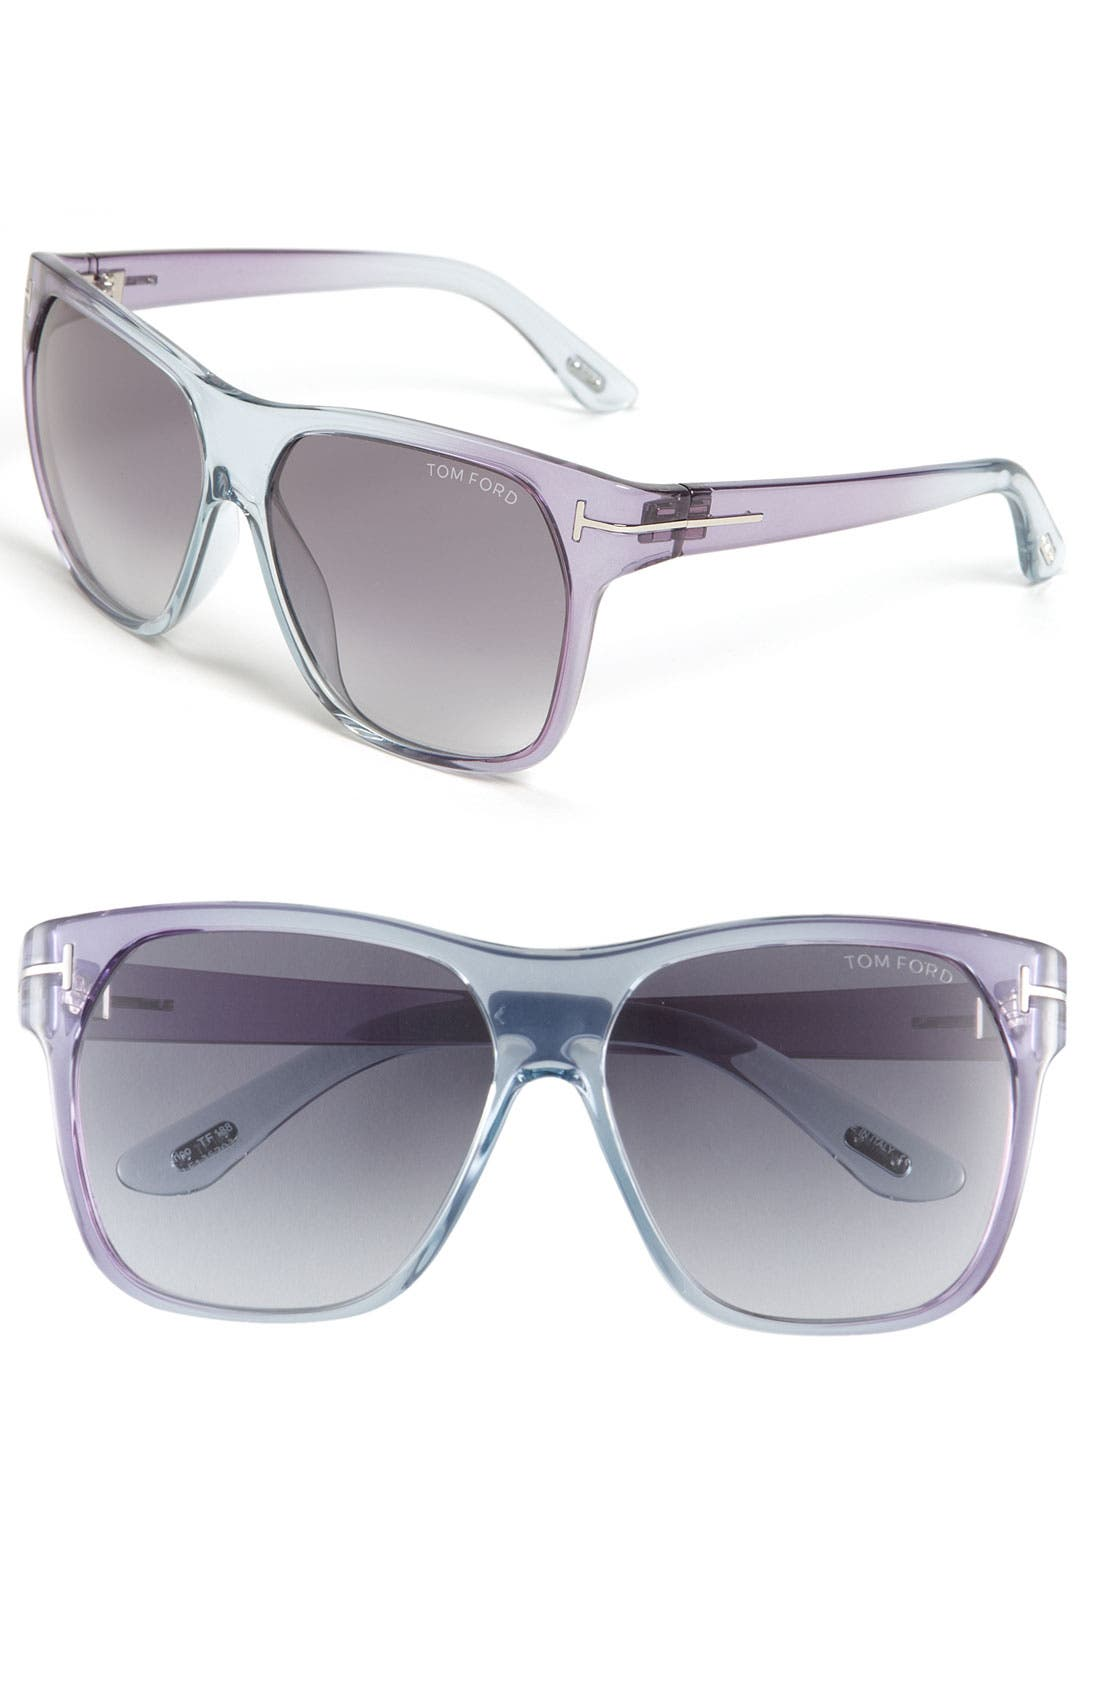 Alternate Image 1 Selected - Tom Ford Oversized Retro Sunglasses